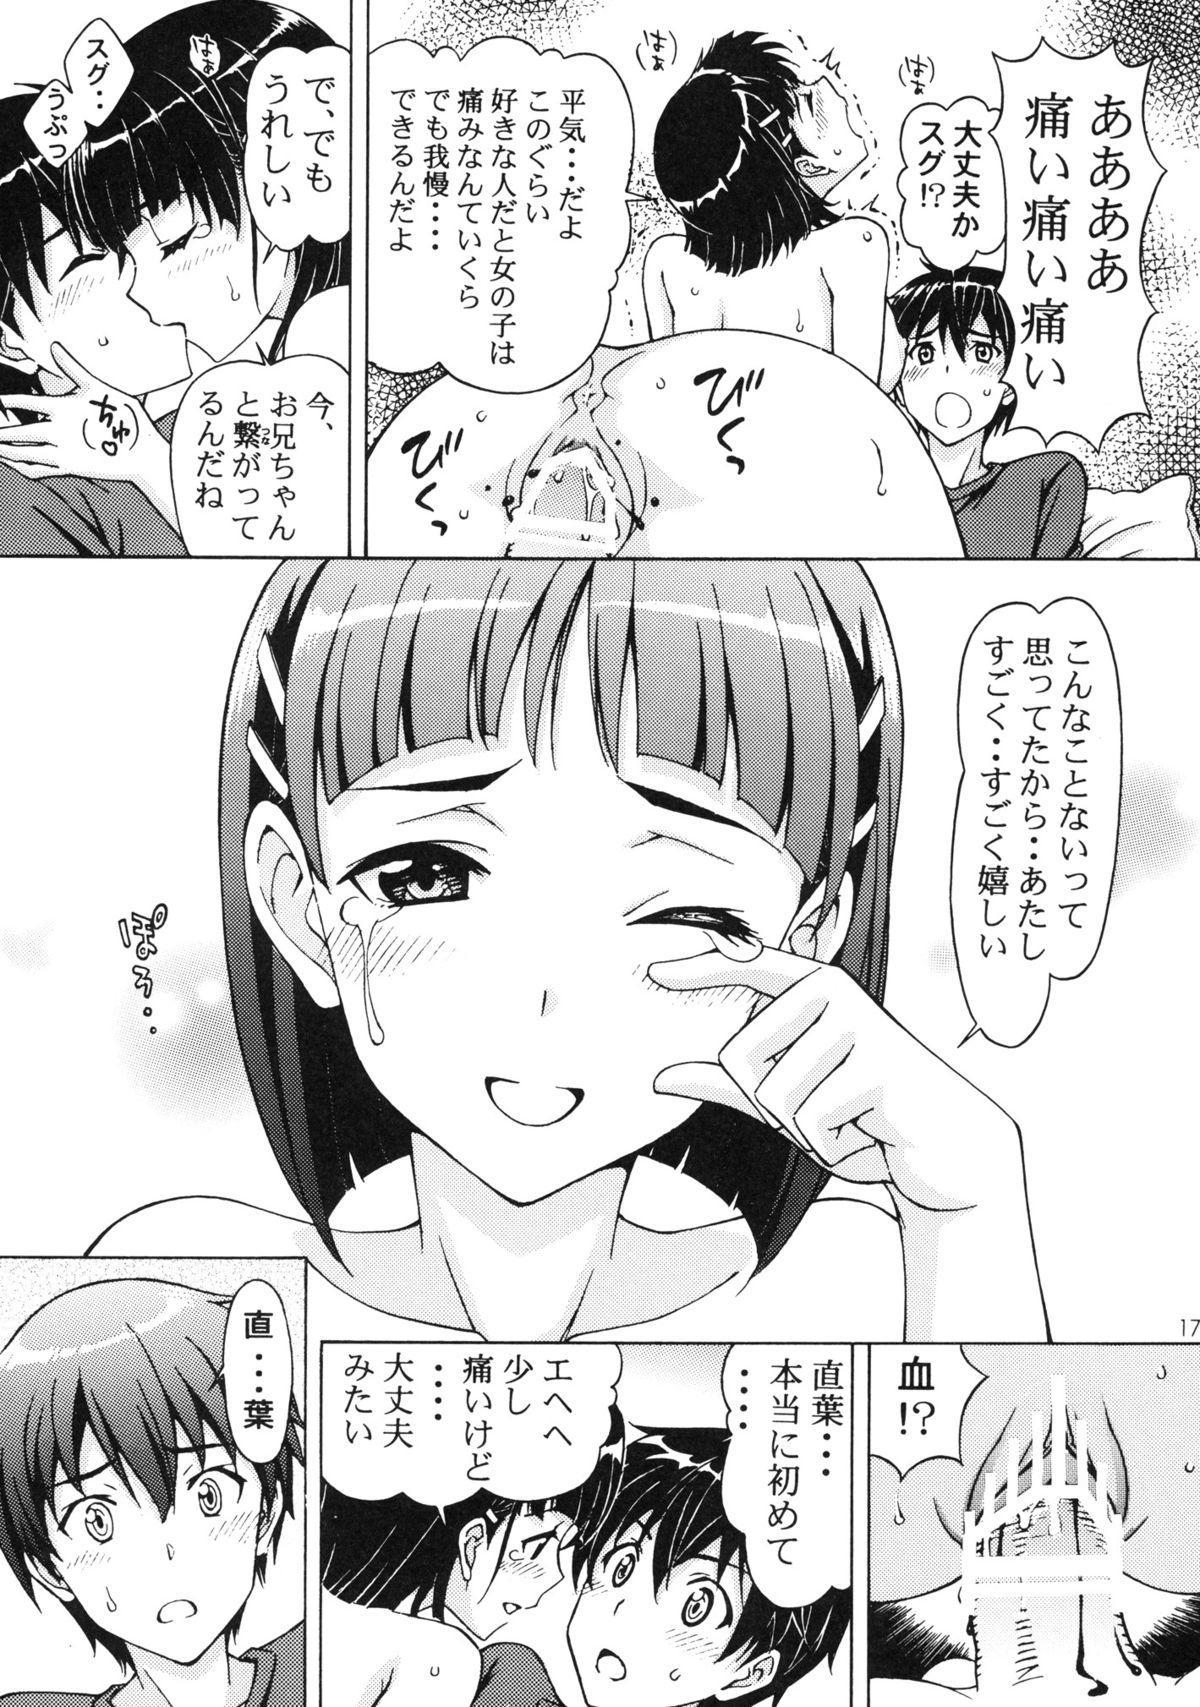 Kinshinsoukan - Nakadashi Suguha 16